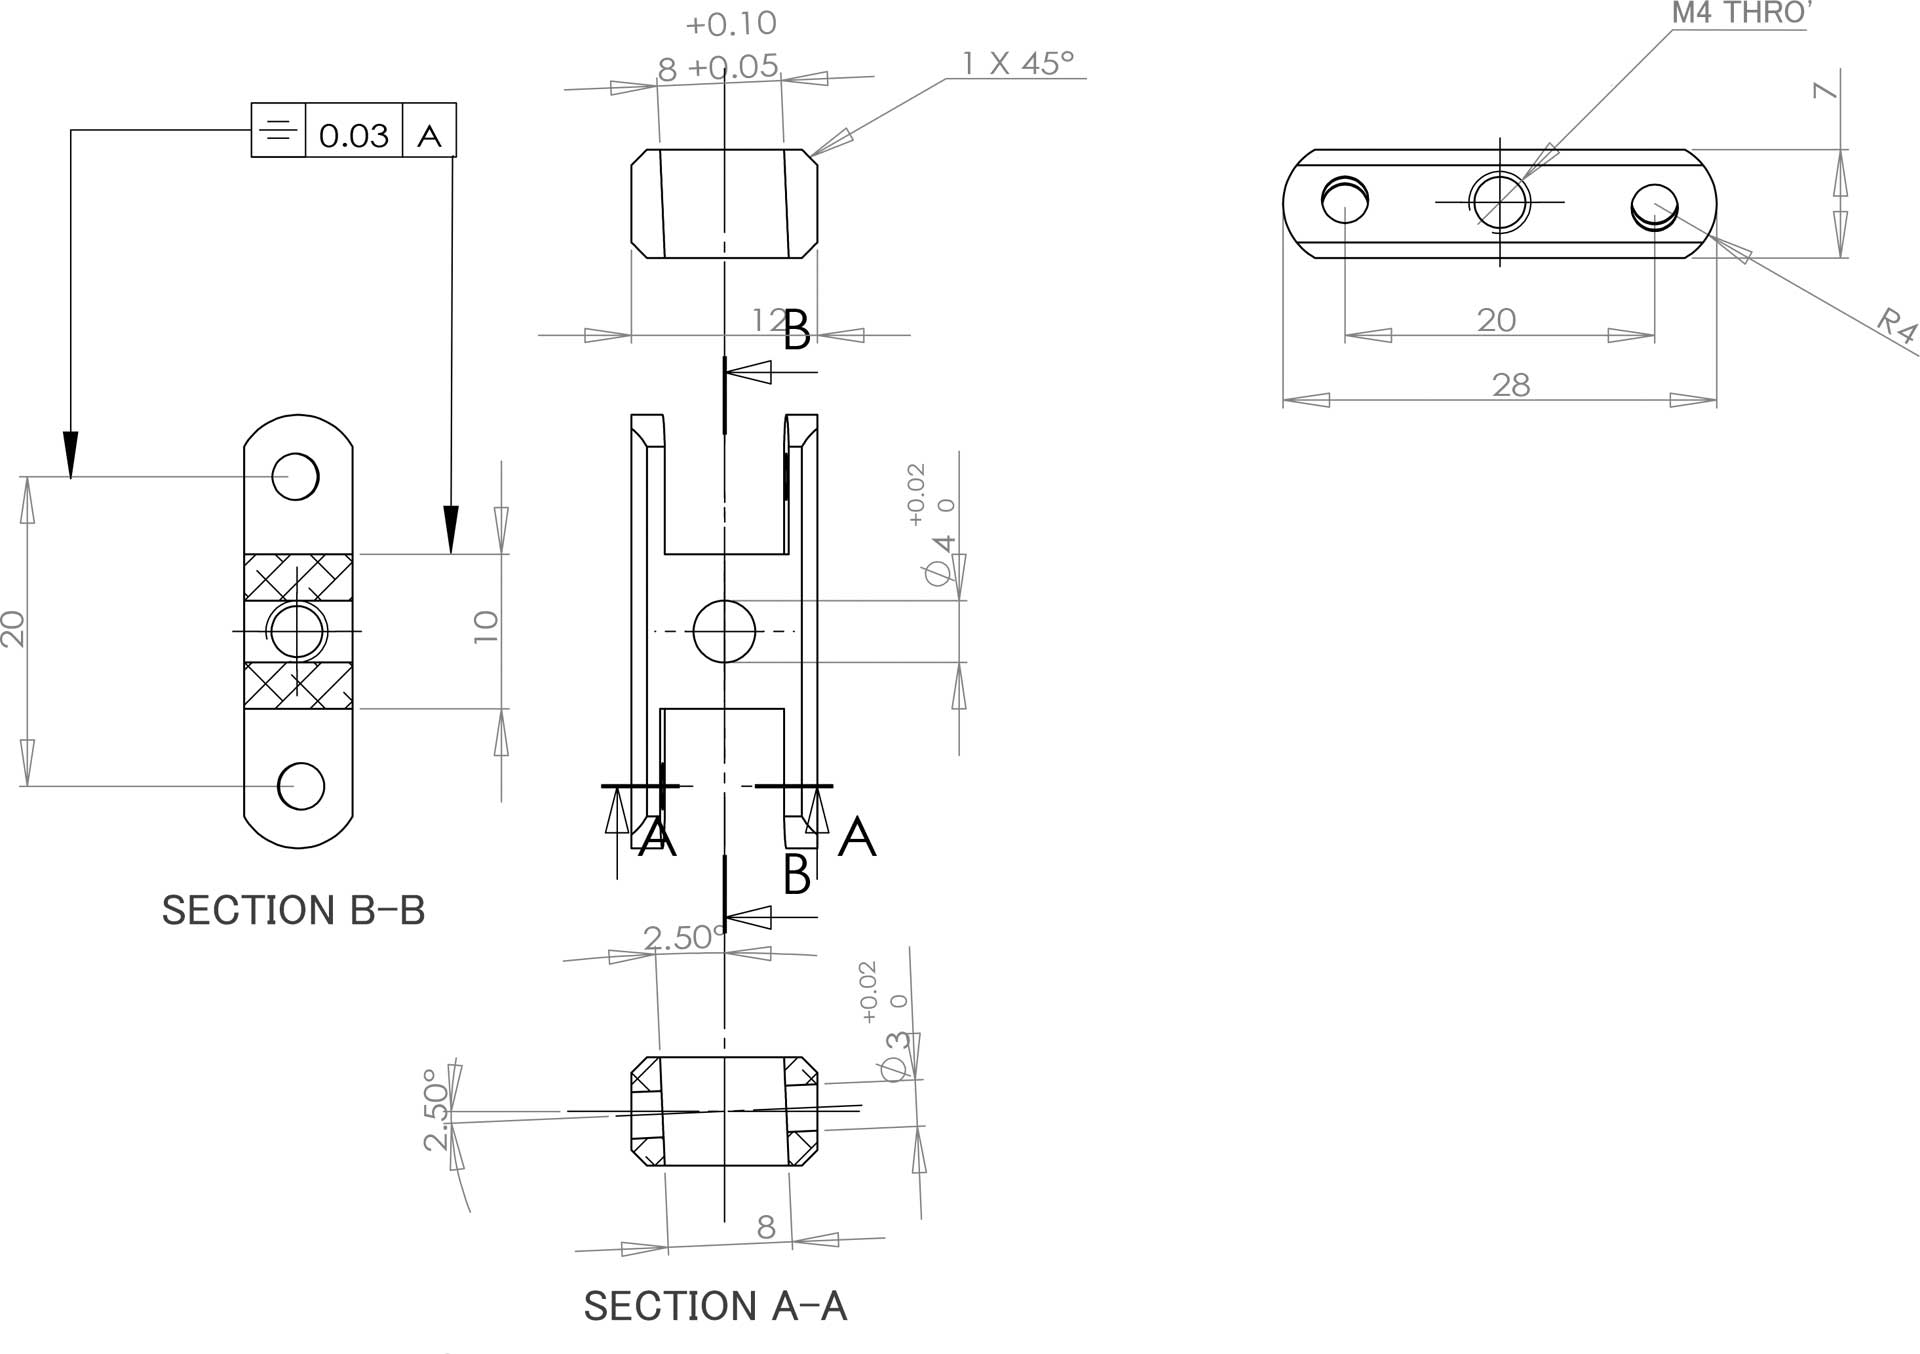 Robbe Modellsport avec telteil LS 5030/14;LS 6330/15, 30mm, 2,5°, 6mm